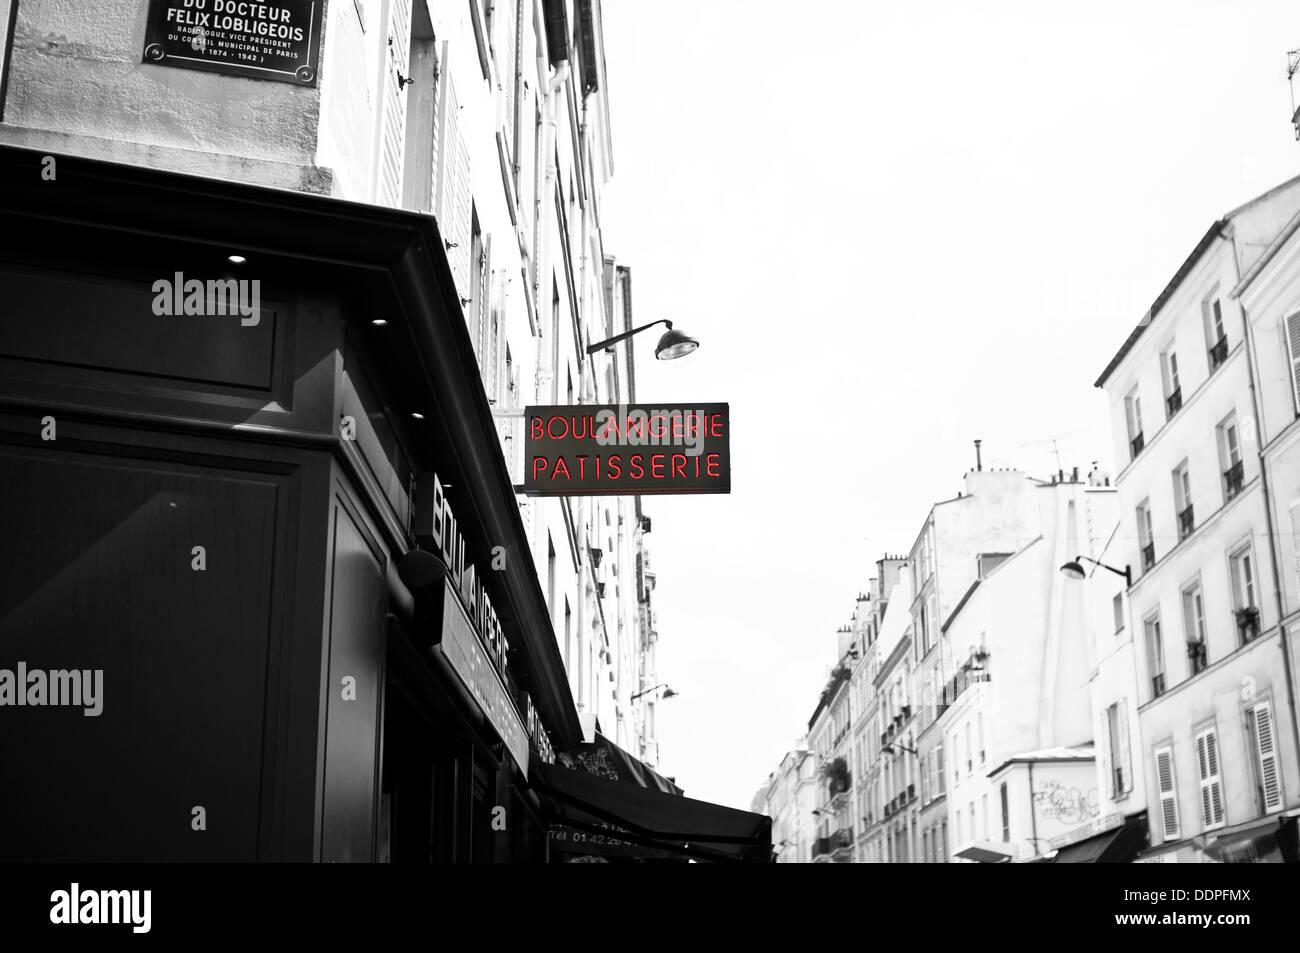 boulangerie patisserie in paris france - Stock Image